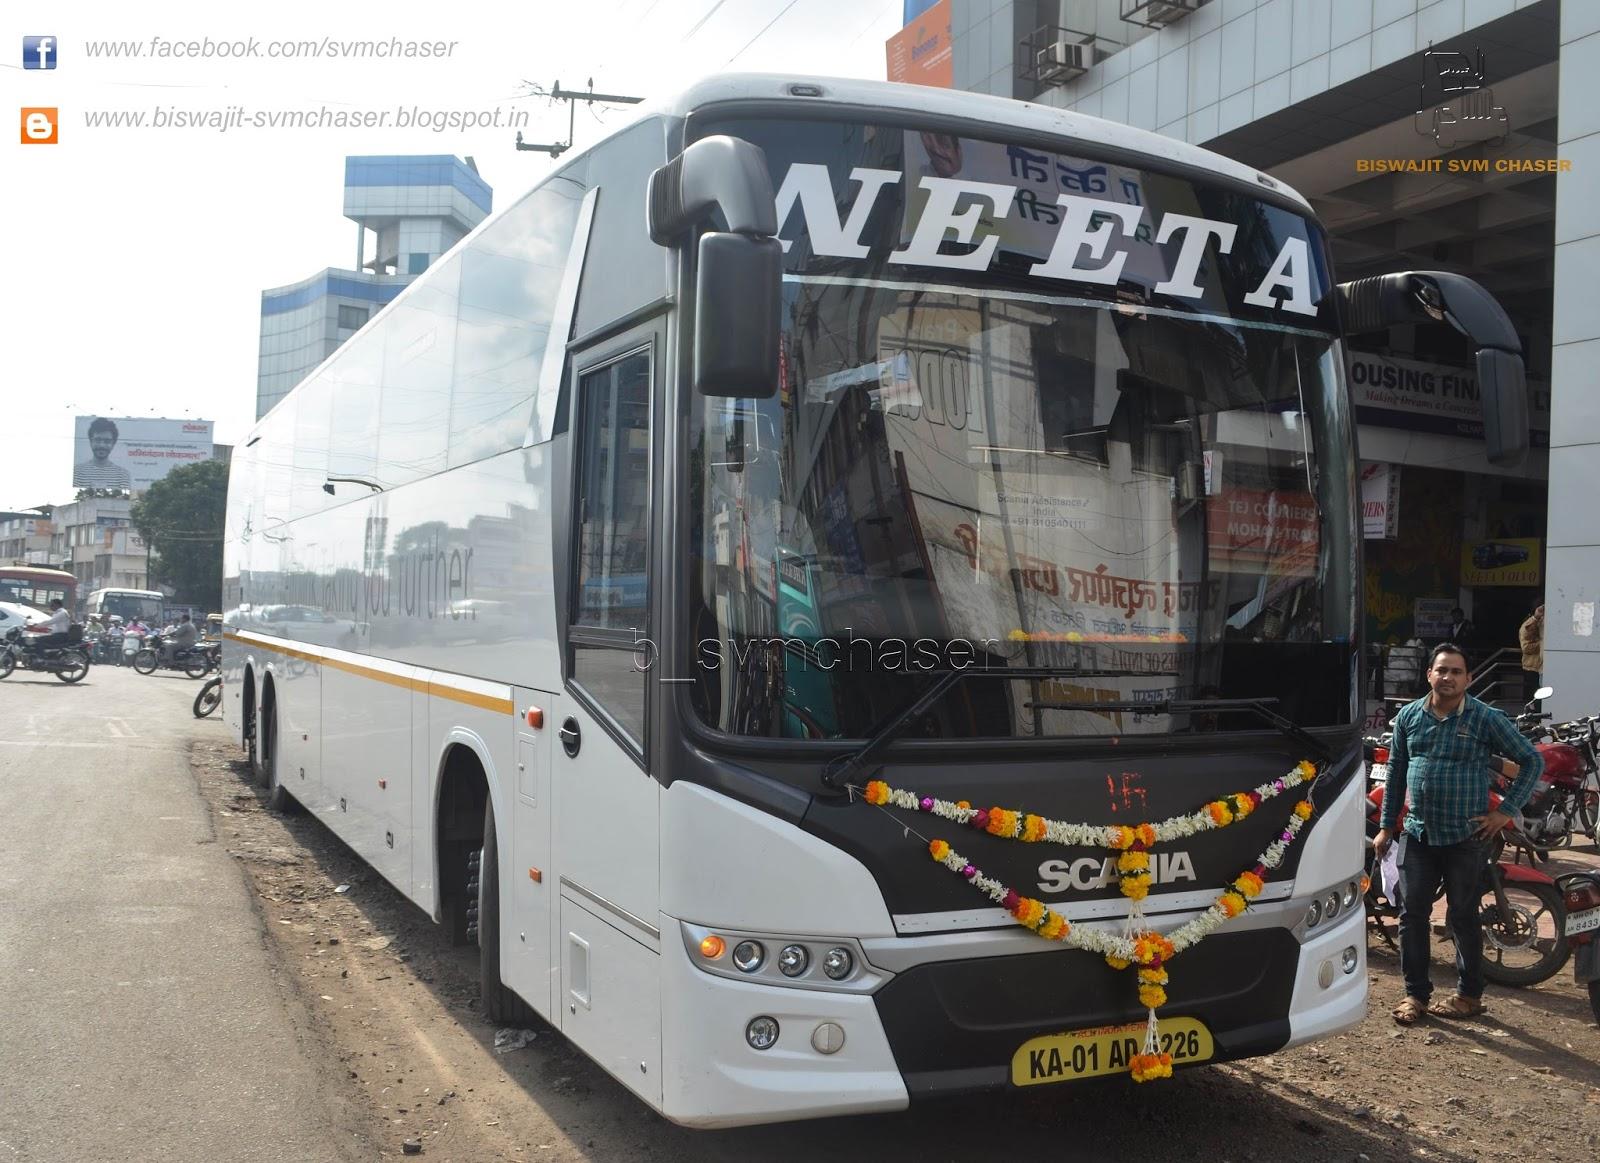 neeta scania metrolink hd multiaxle semi sleeper  on trial